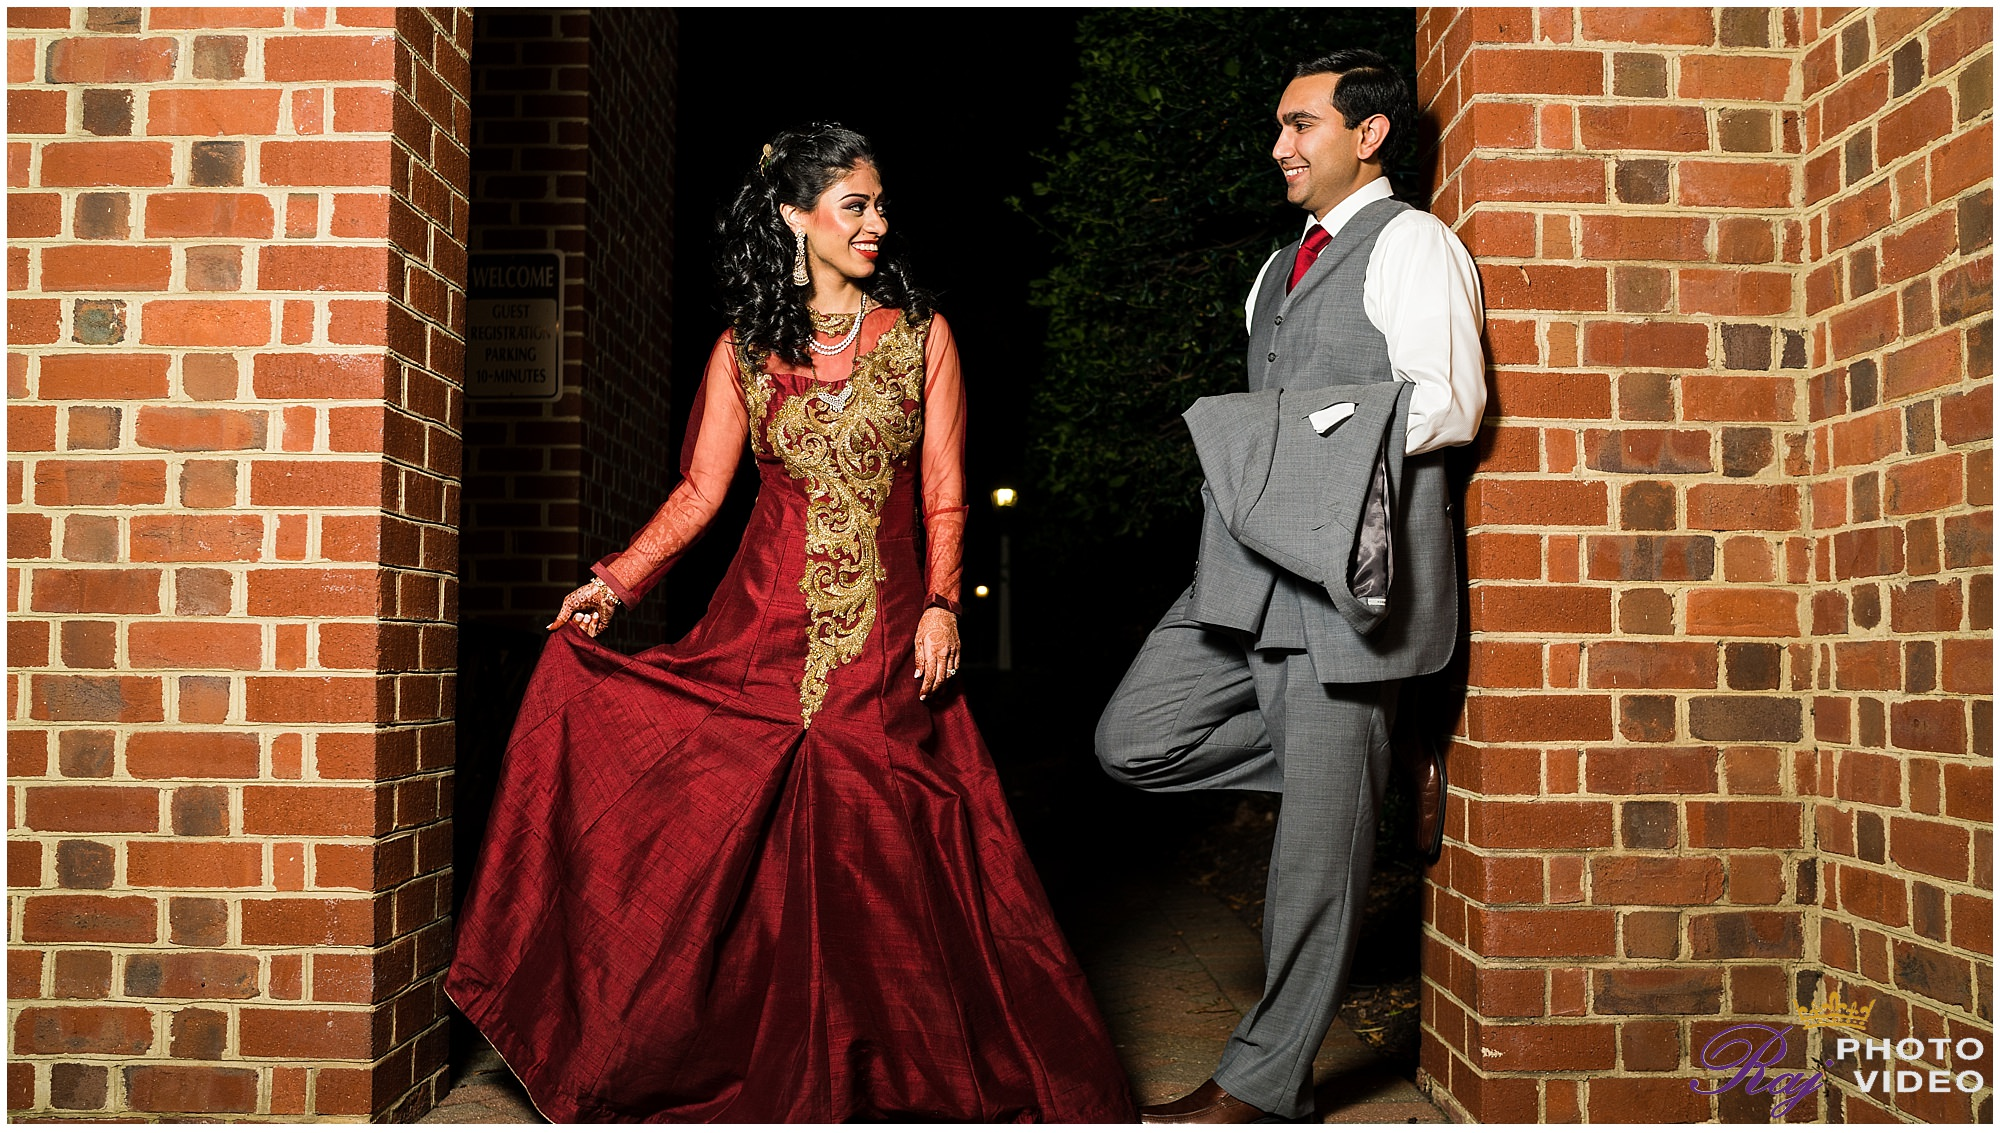 Founders-Inn-and-Spa-Virginia-Beach-VA-Indian-Wedding-Harini-Vivek-68.jpg